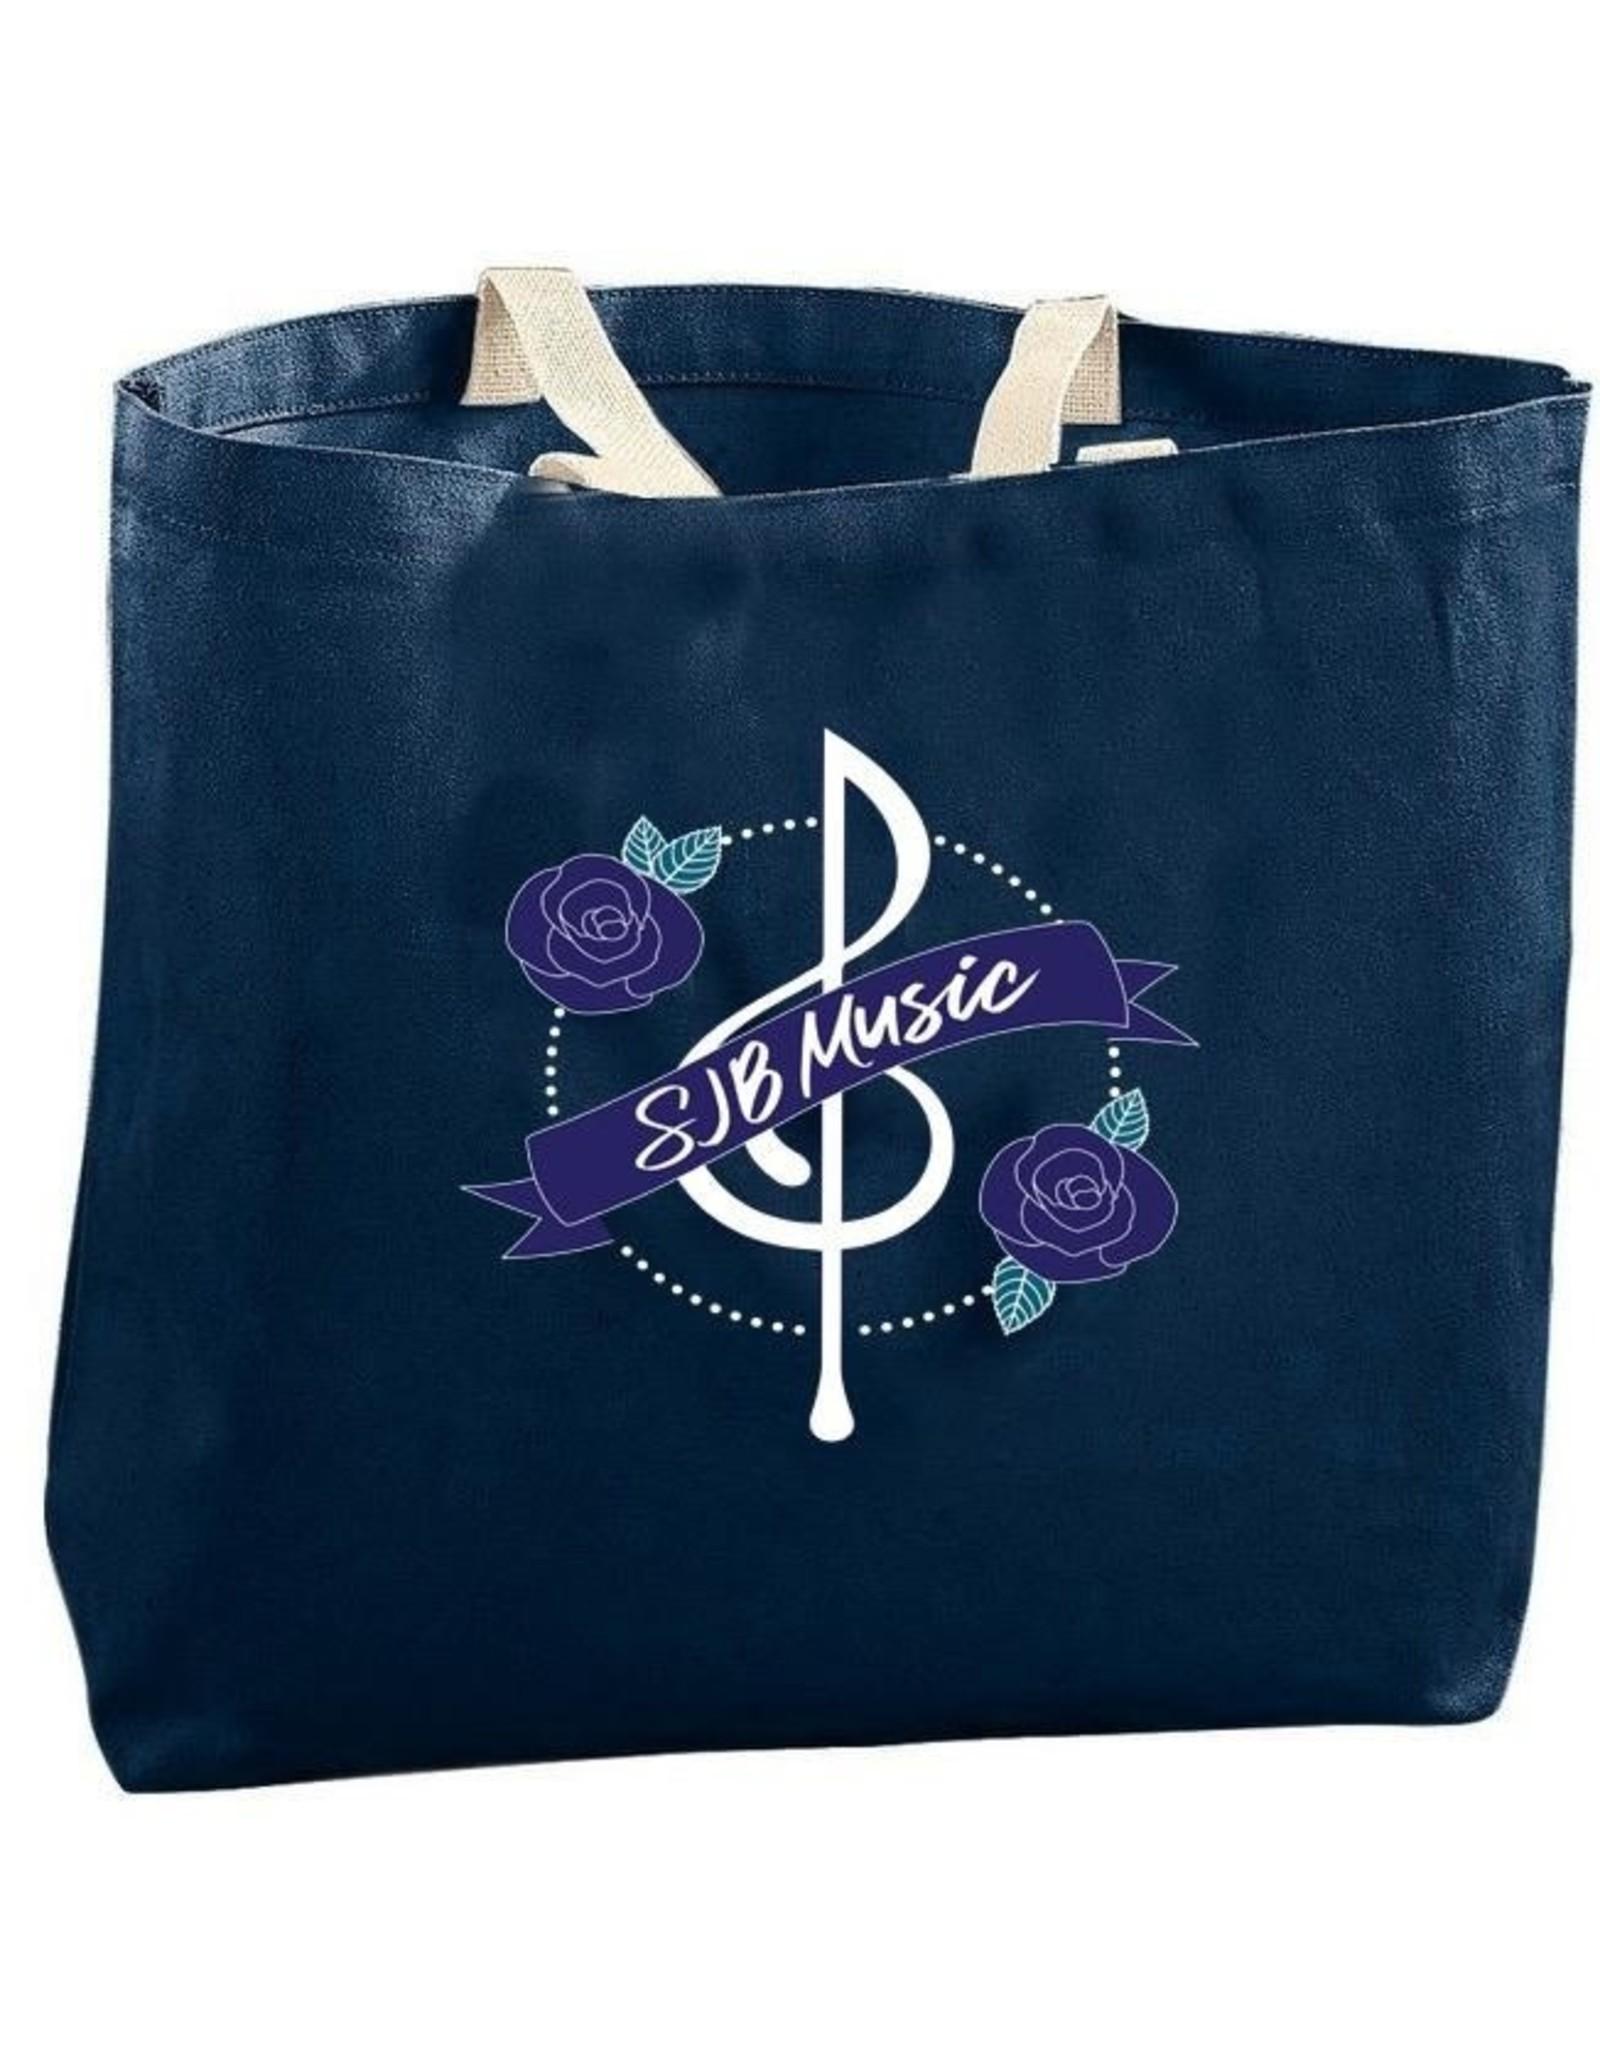 NON-UNIFORM SJB Music Tote Bag, SJBMS